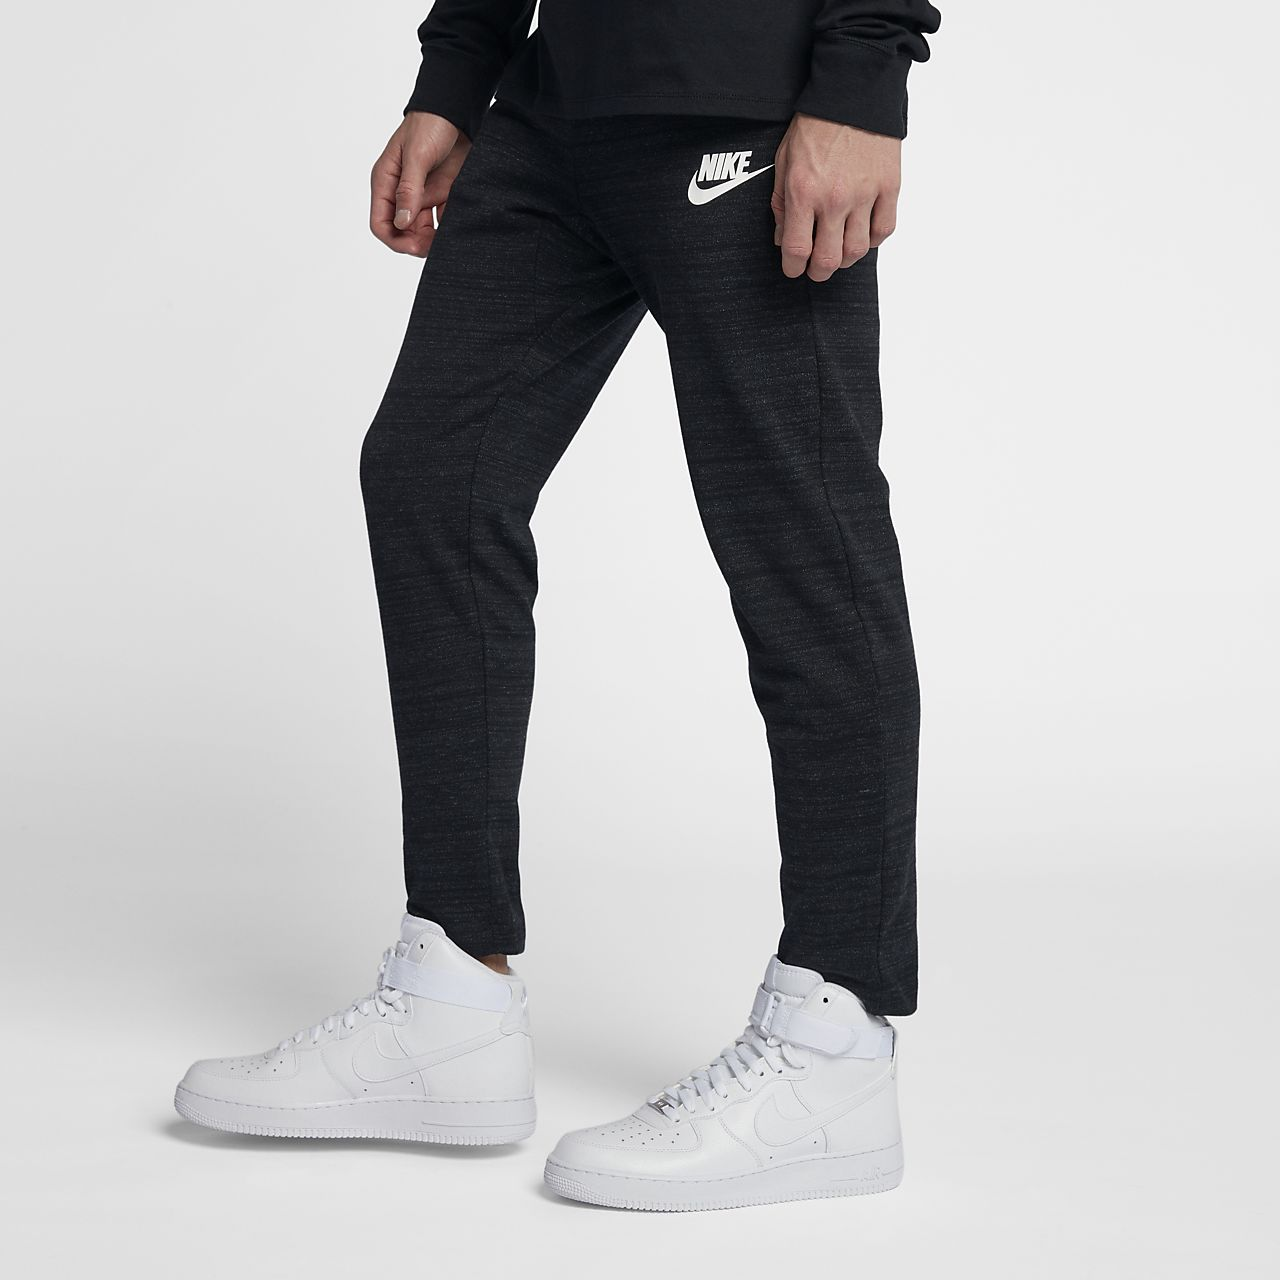 3e11bb02af5d7d Nike Sportswear Advance 15 Men s Trousers. Nike.com PT